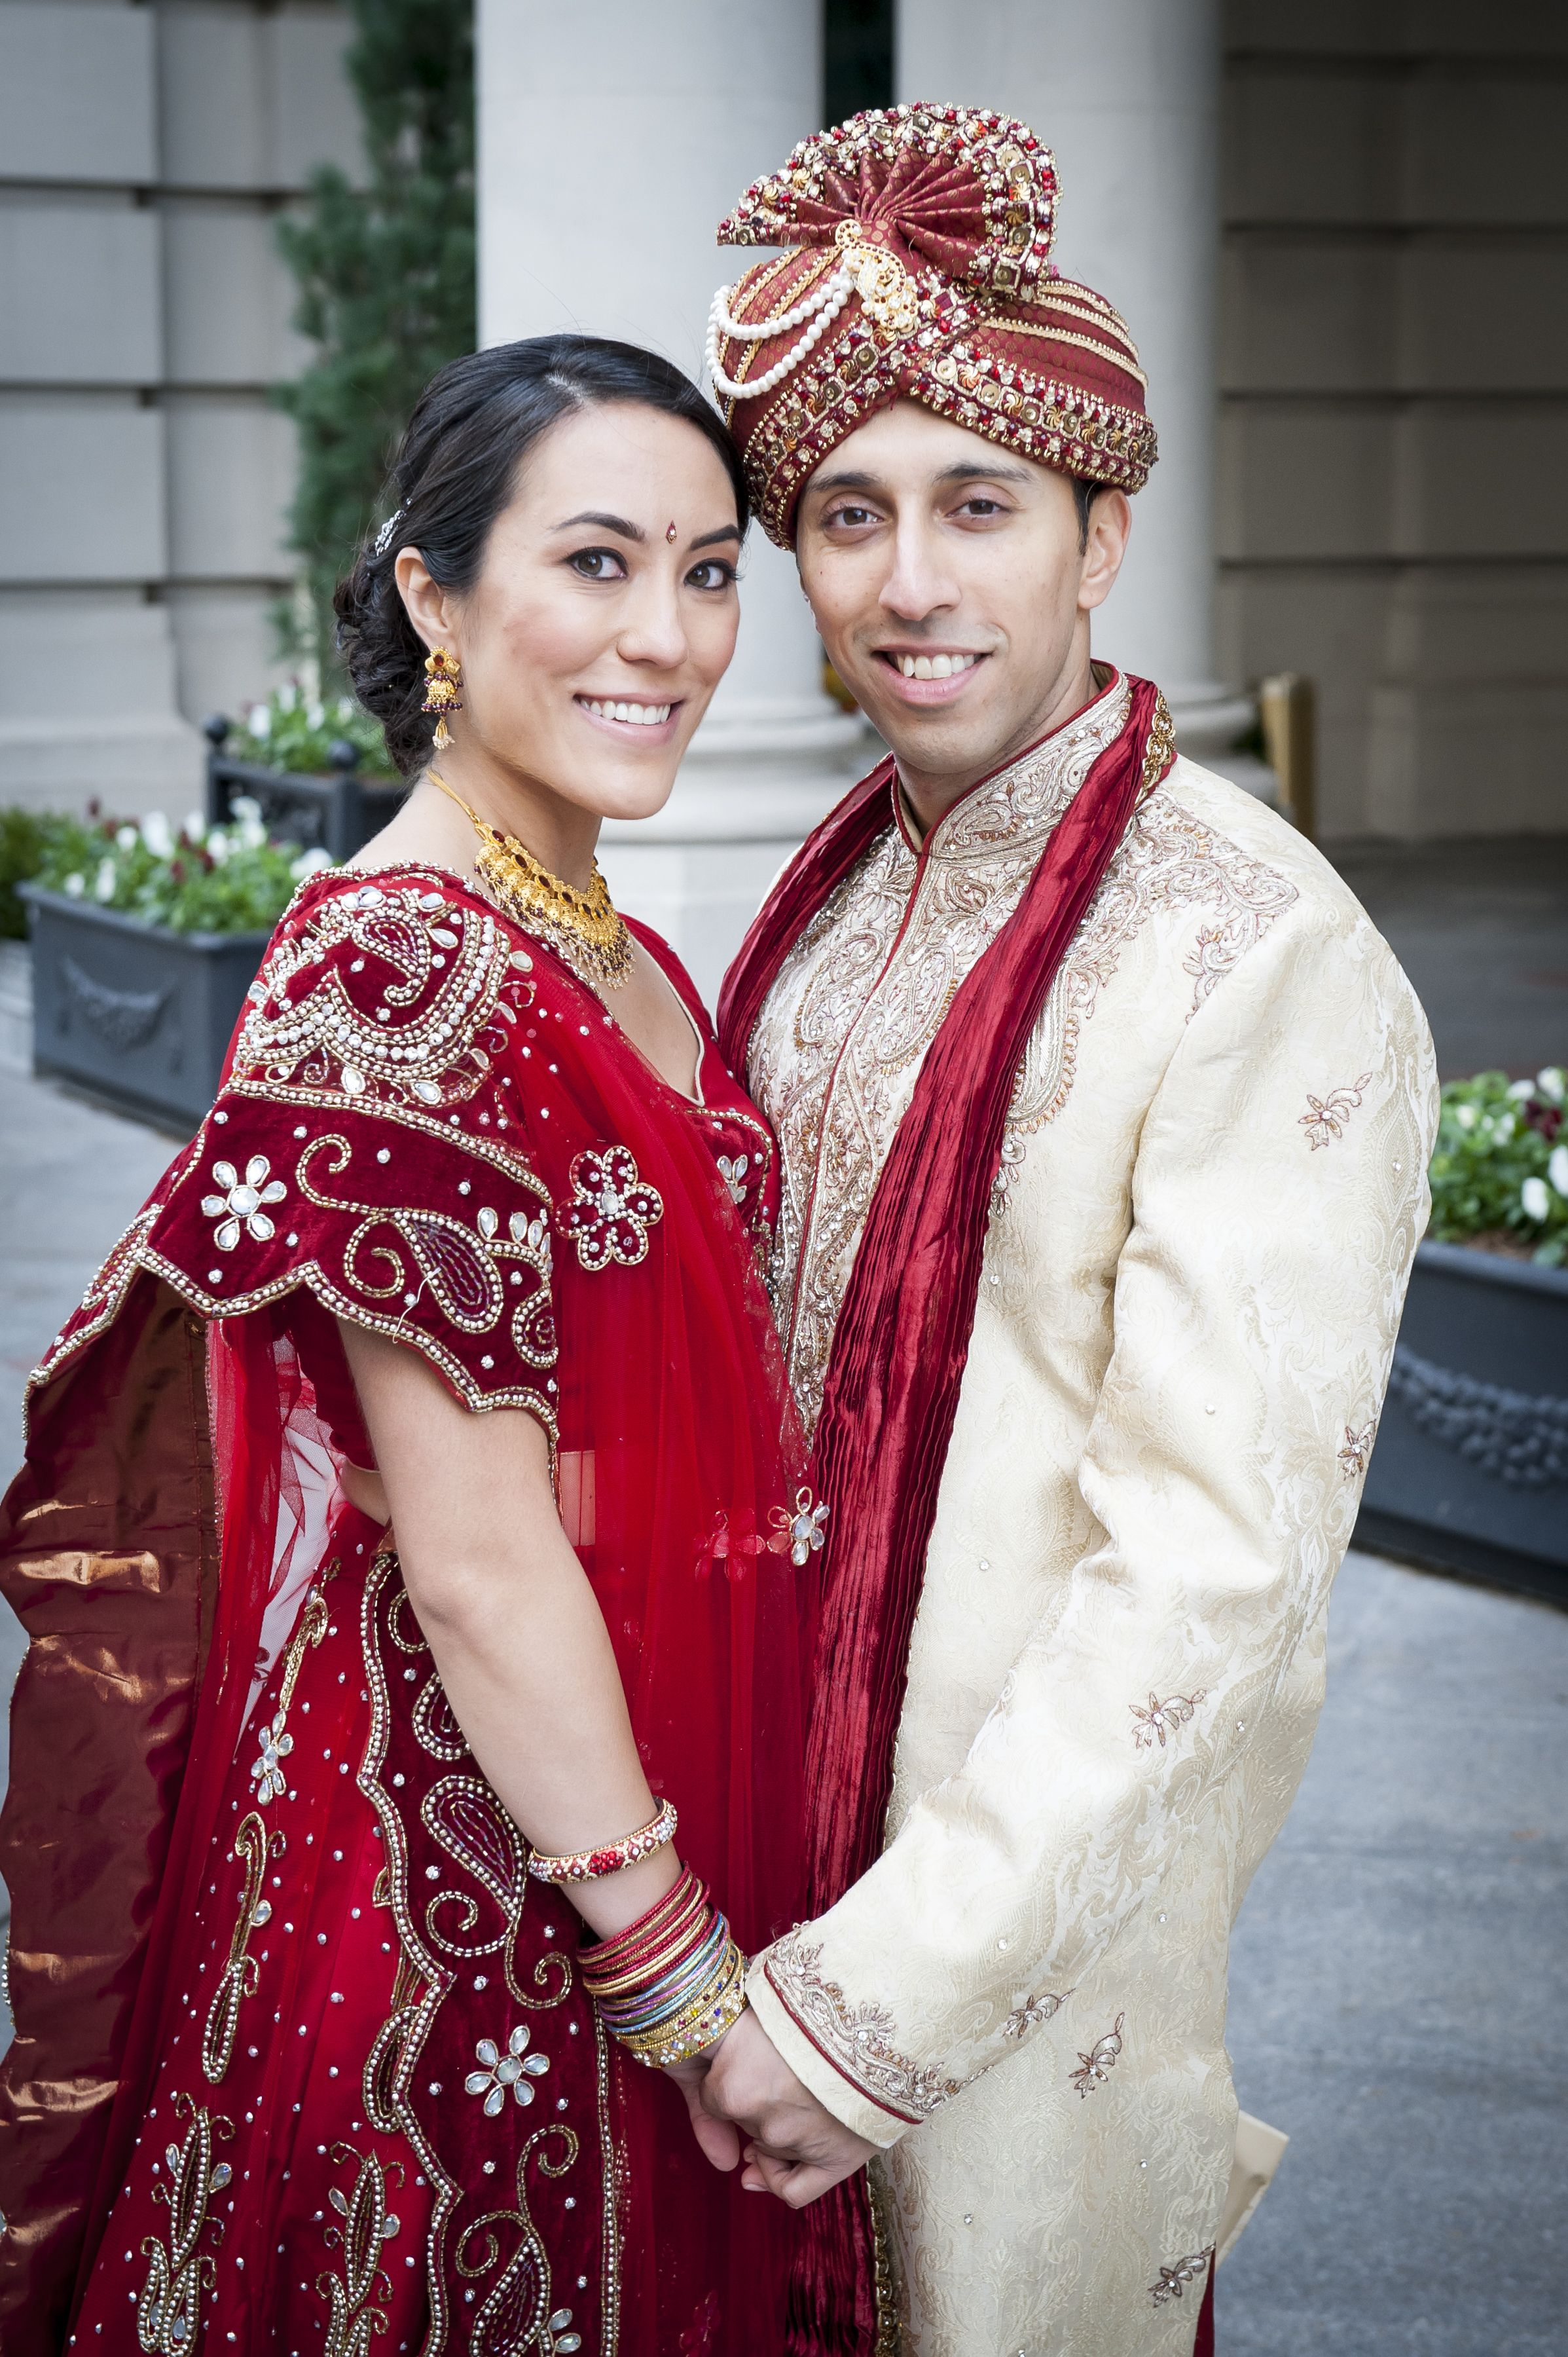 Korean American Bride And Indian Groom Indian Wedding In Dc Www